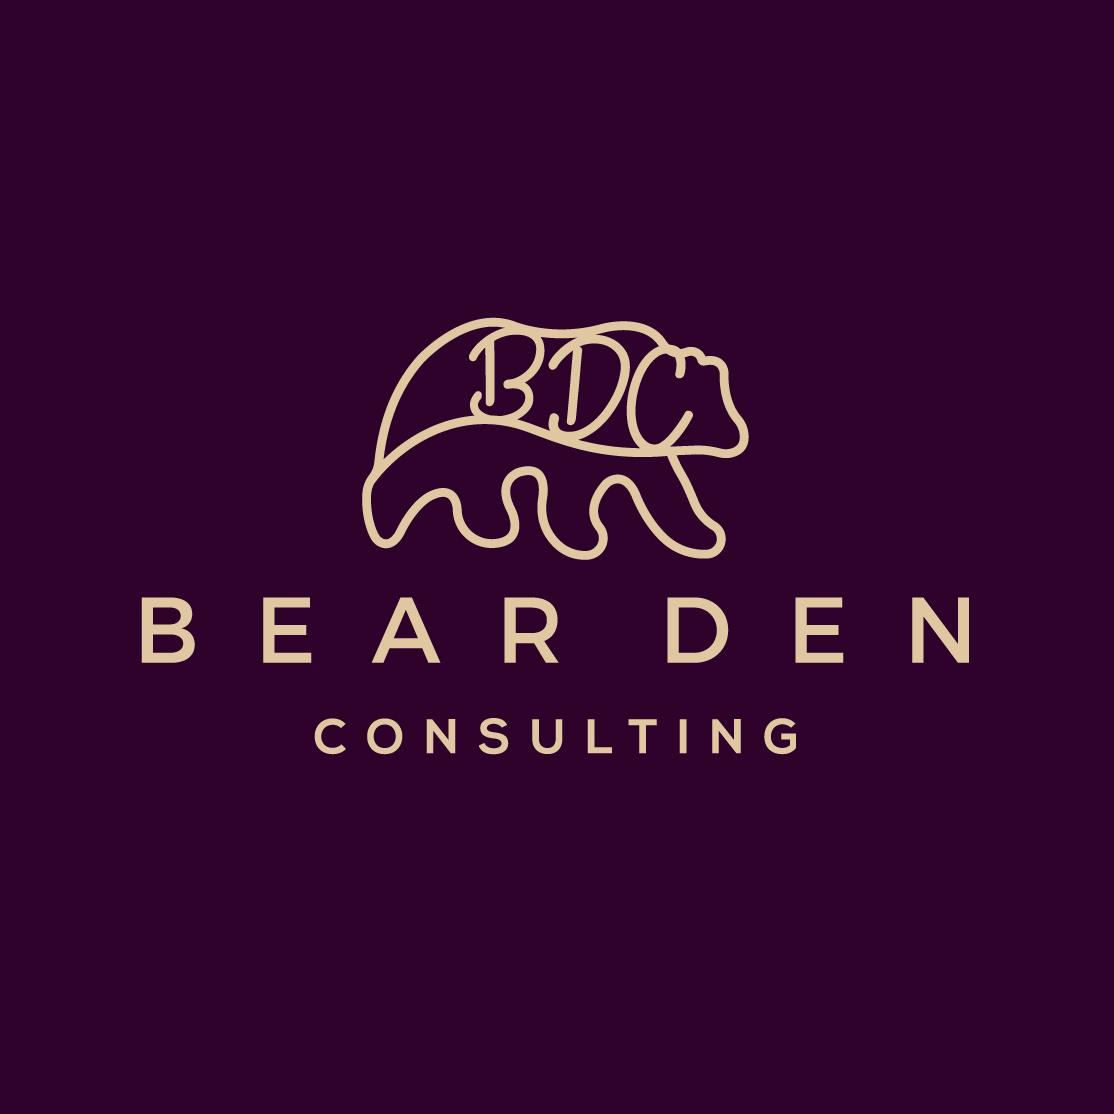 BearDen Purple FB Profile Image.jpg